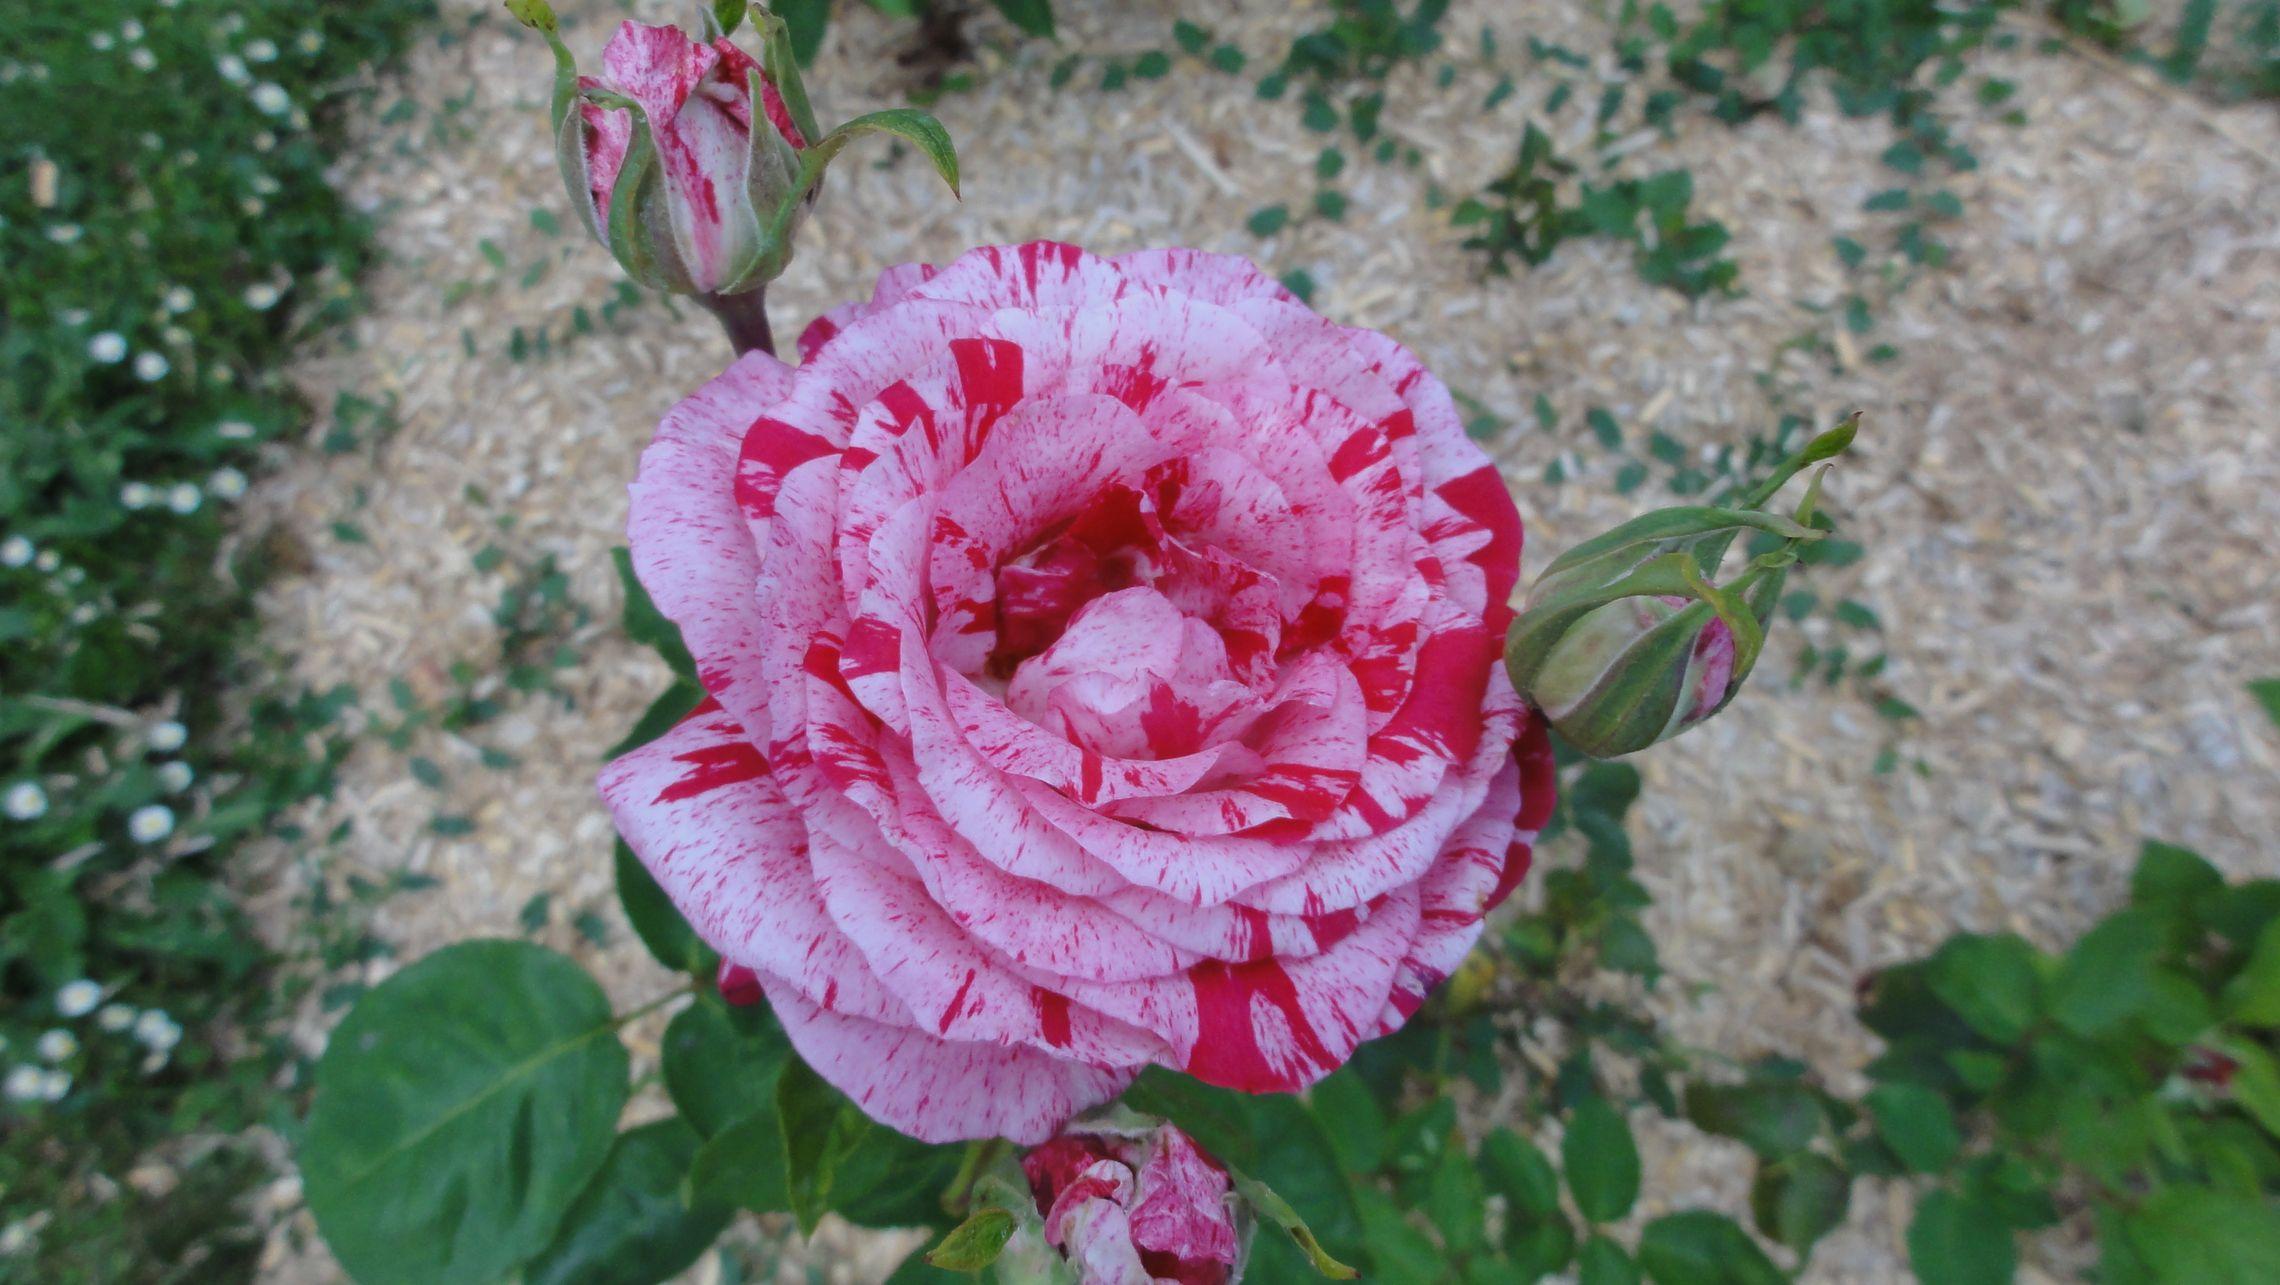 20170602 roseraie vdm 14